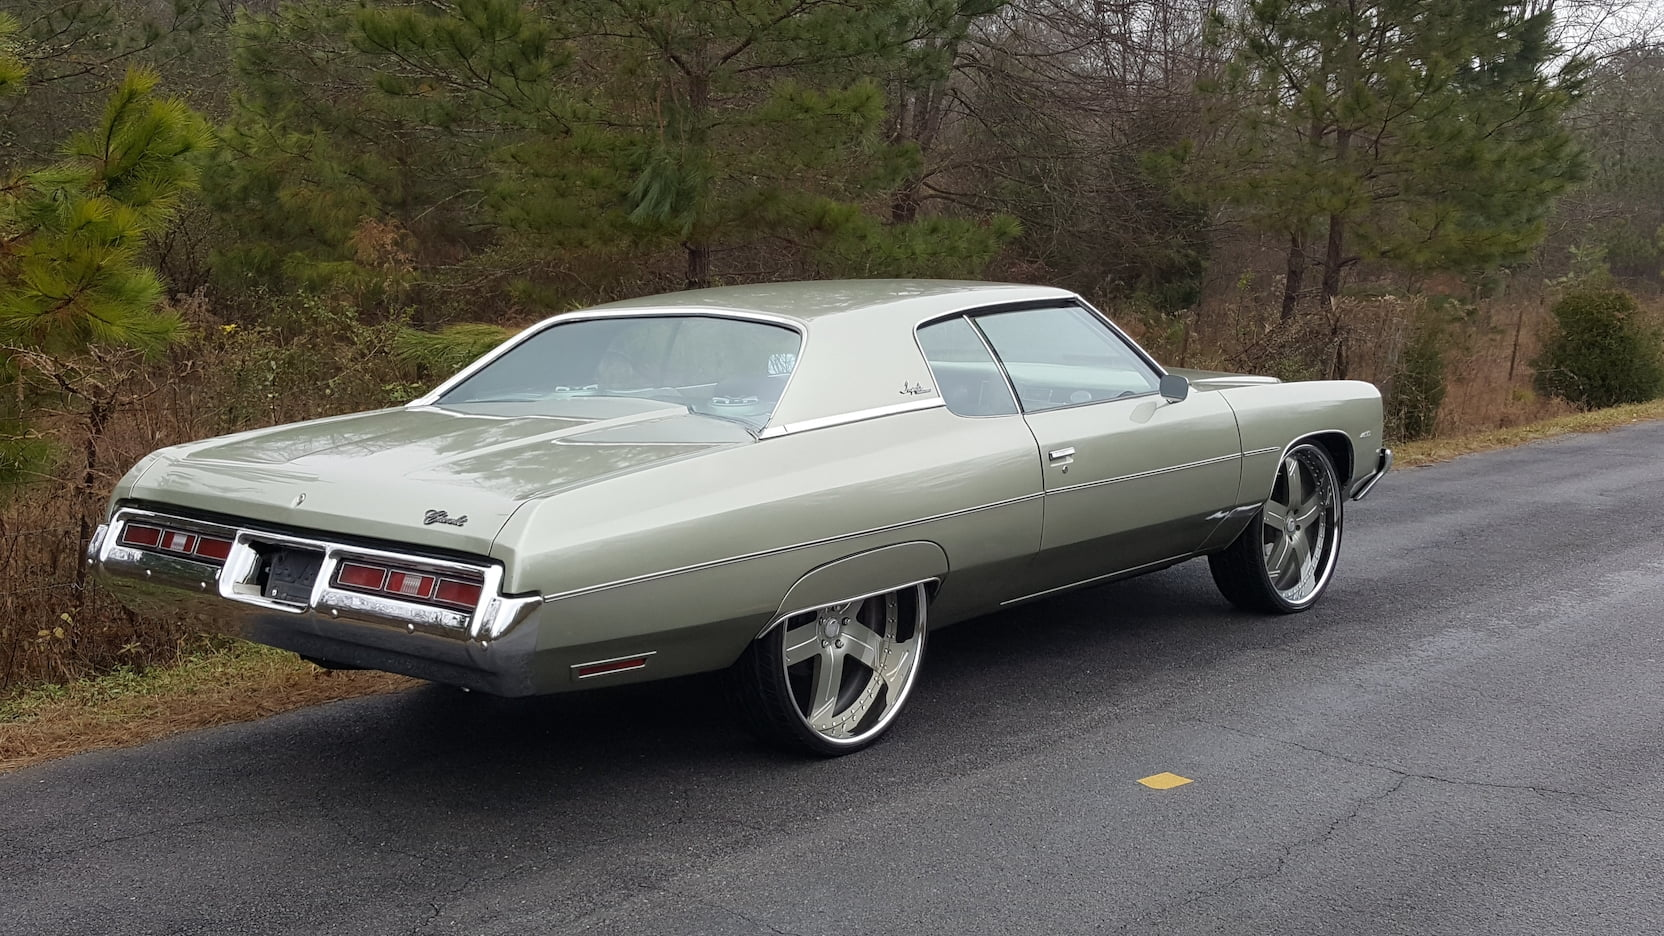 1972 Chevrolet Impala Custom - Year of Clean Water